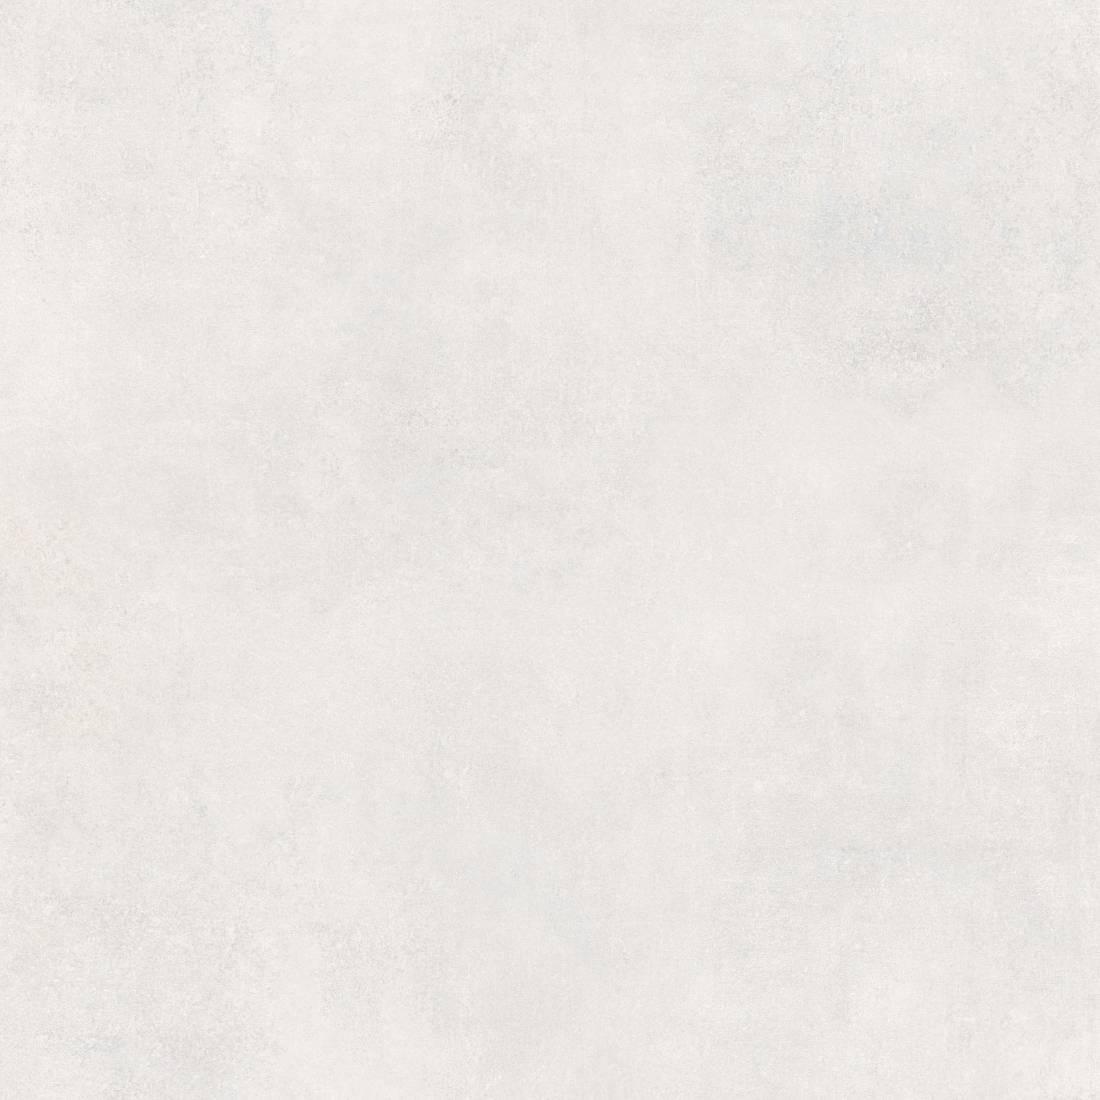 Metropoli 80x80 Blanco 1